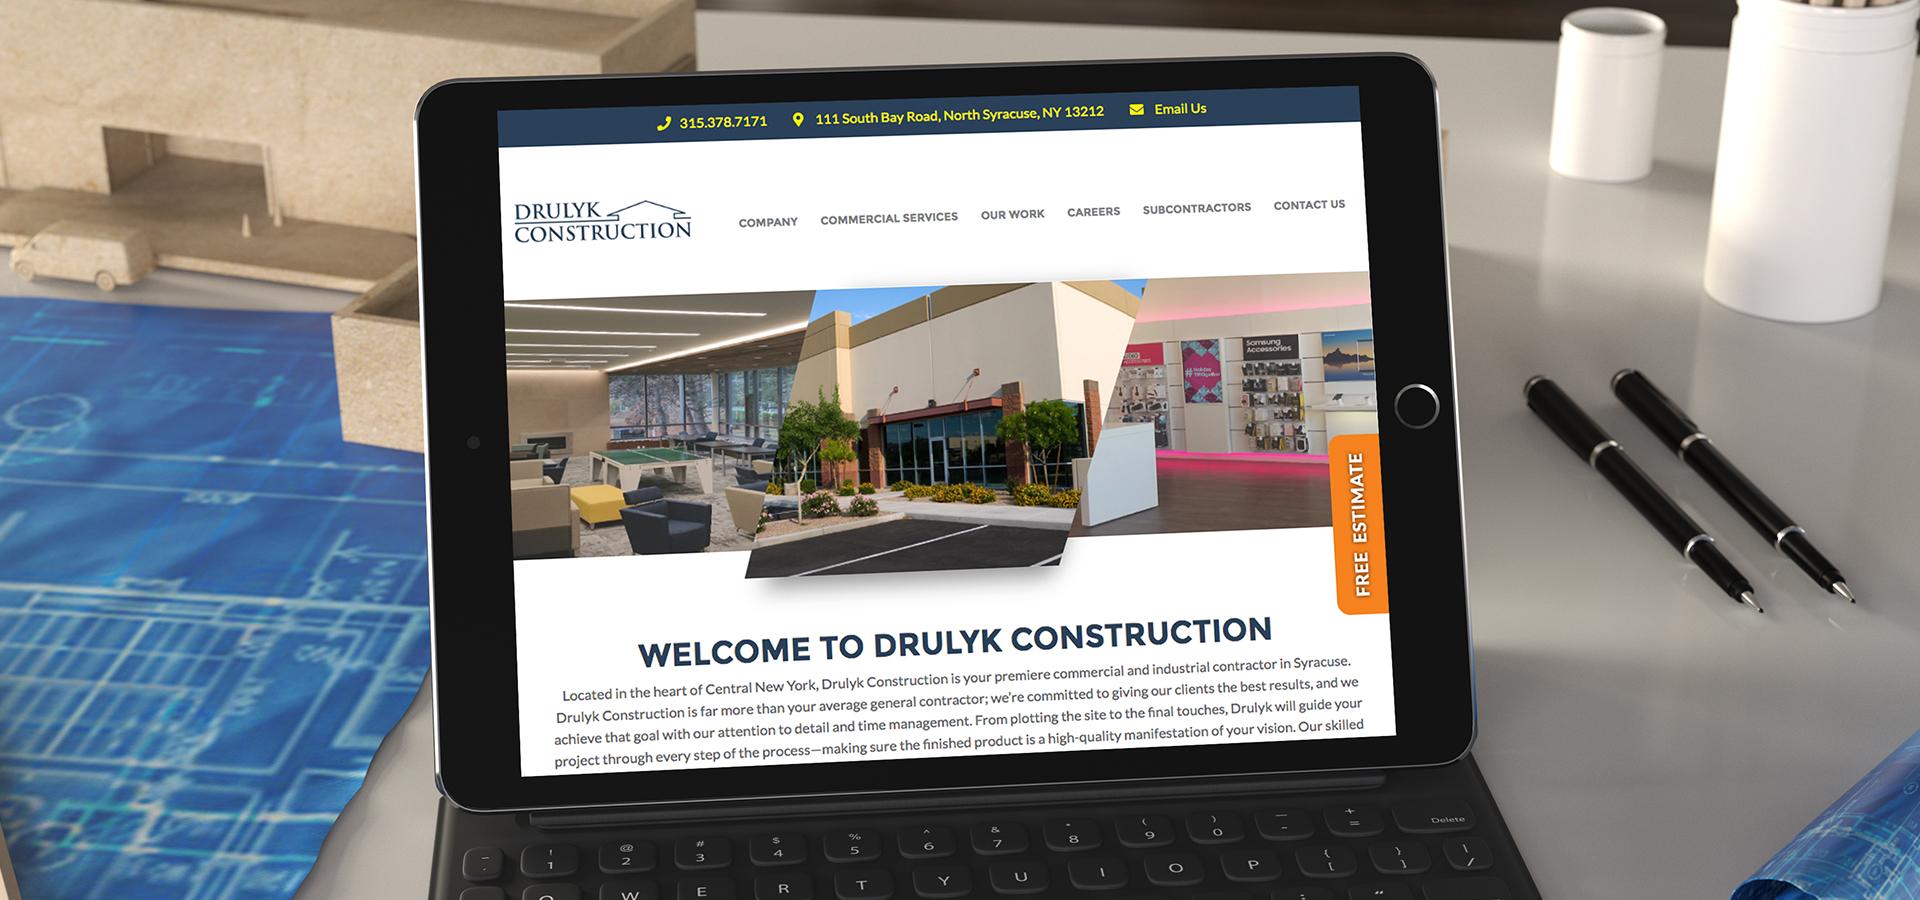 drulyk construction website on ipad